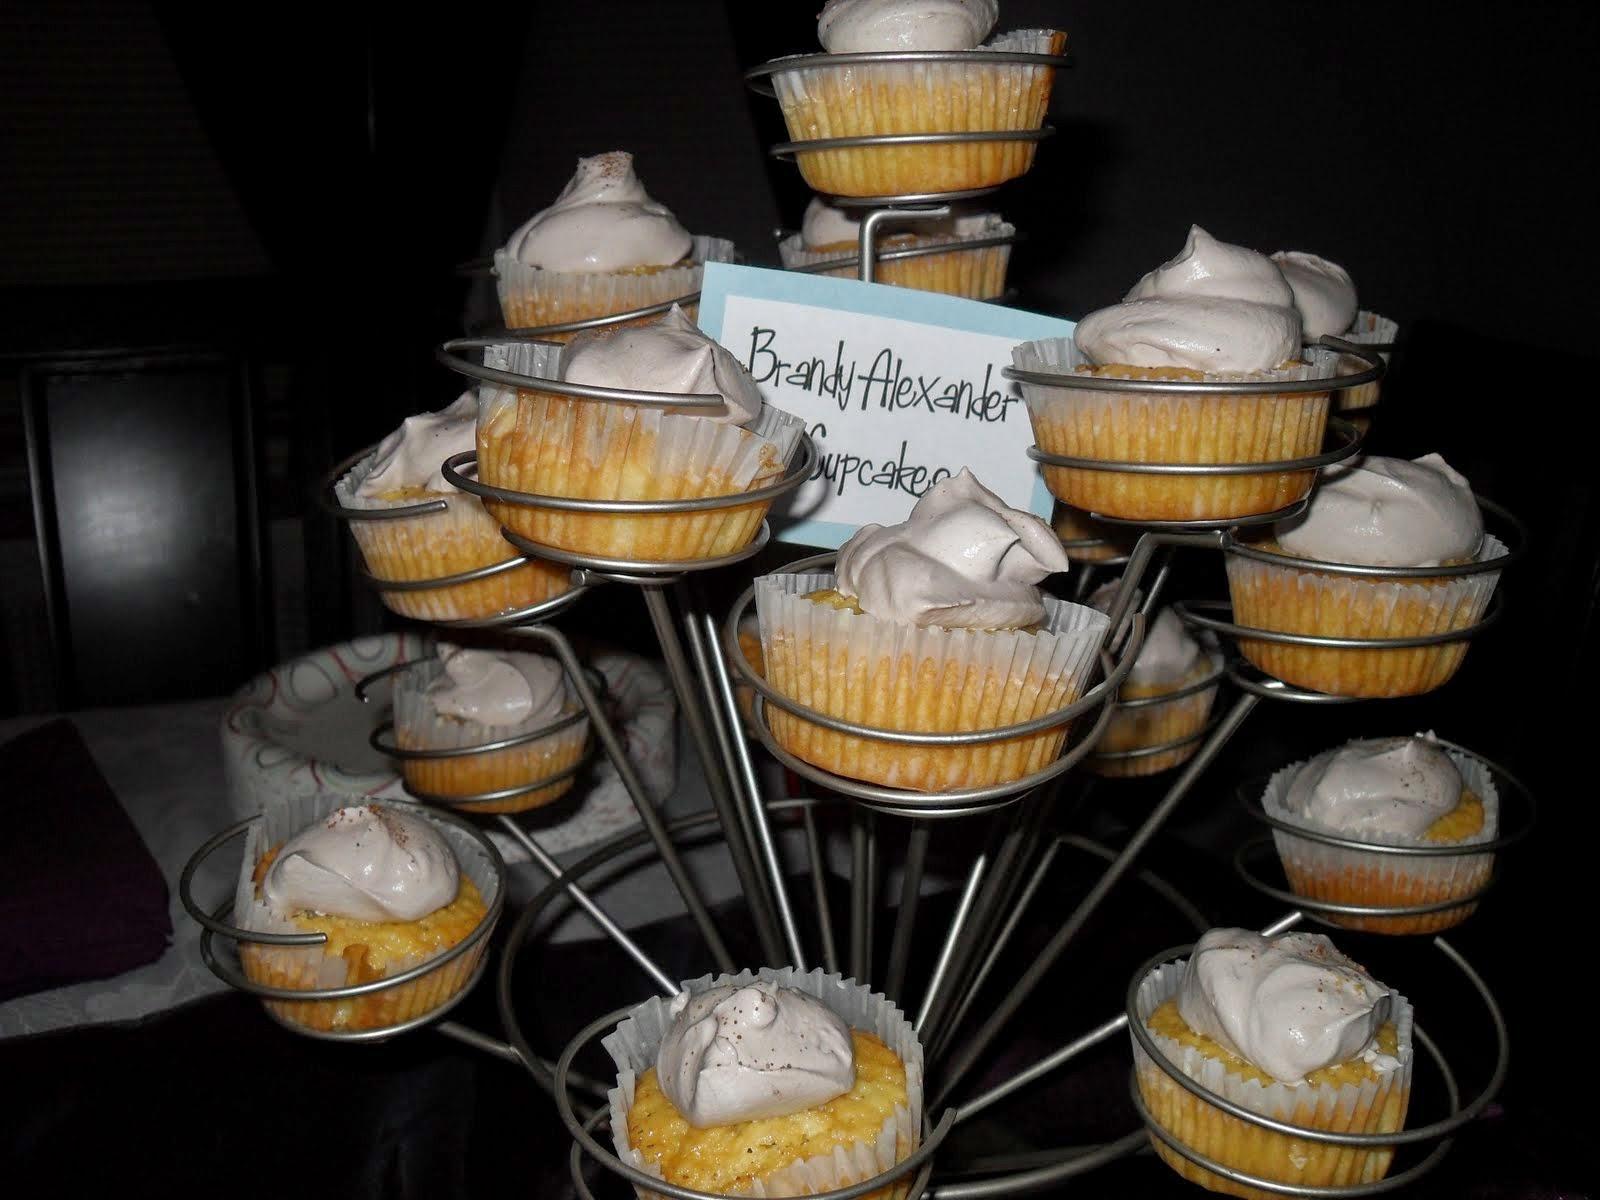 http://laurakulisekbaking.blogspot.com/2011/02/brandy-alexander-cupcakes.html